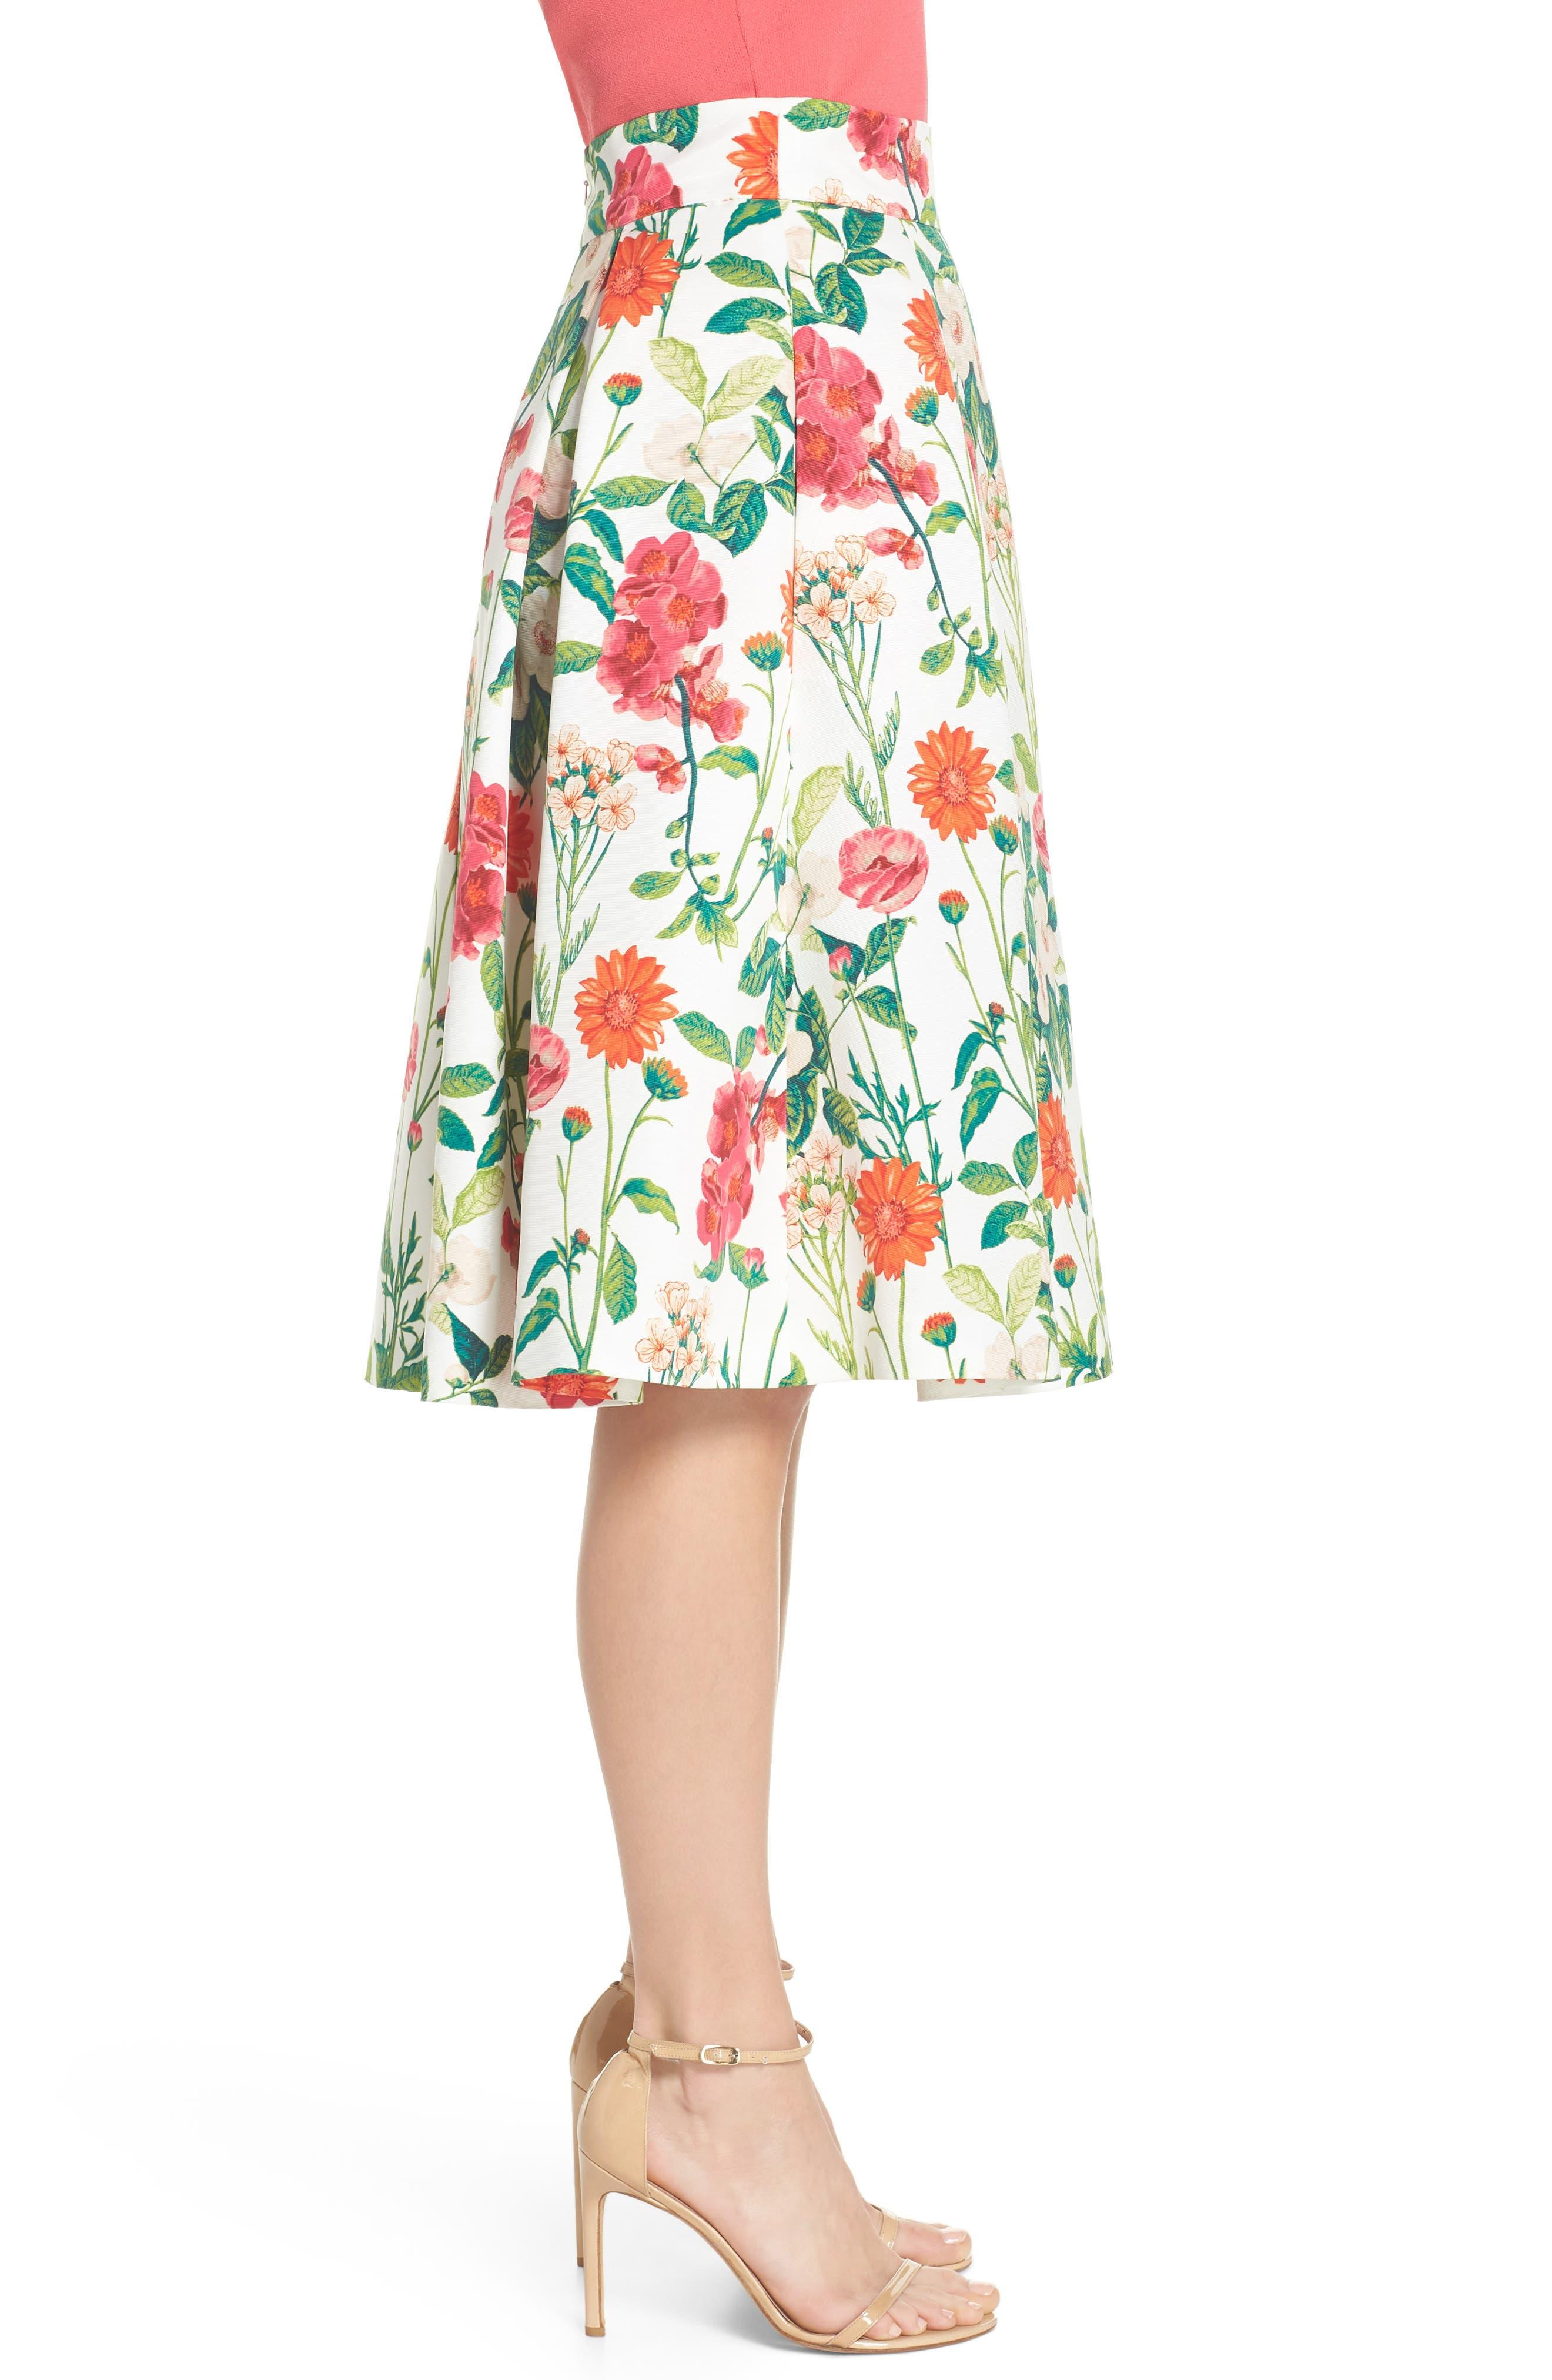 Floral A-Line Skirt,                             Alternate thumbnail 3, color,                             901